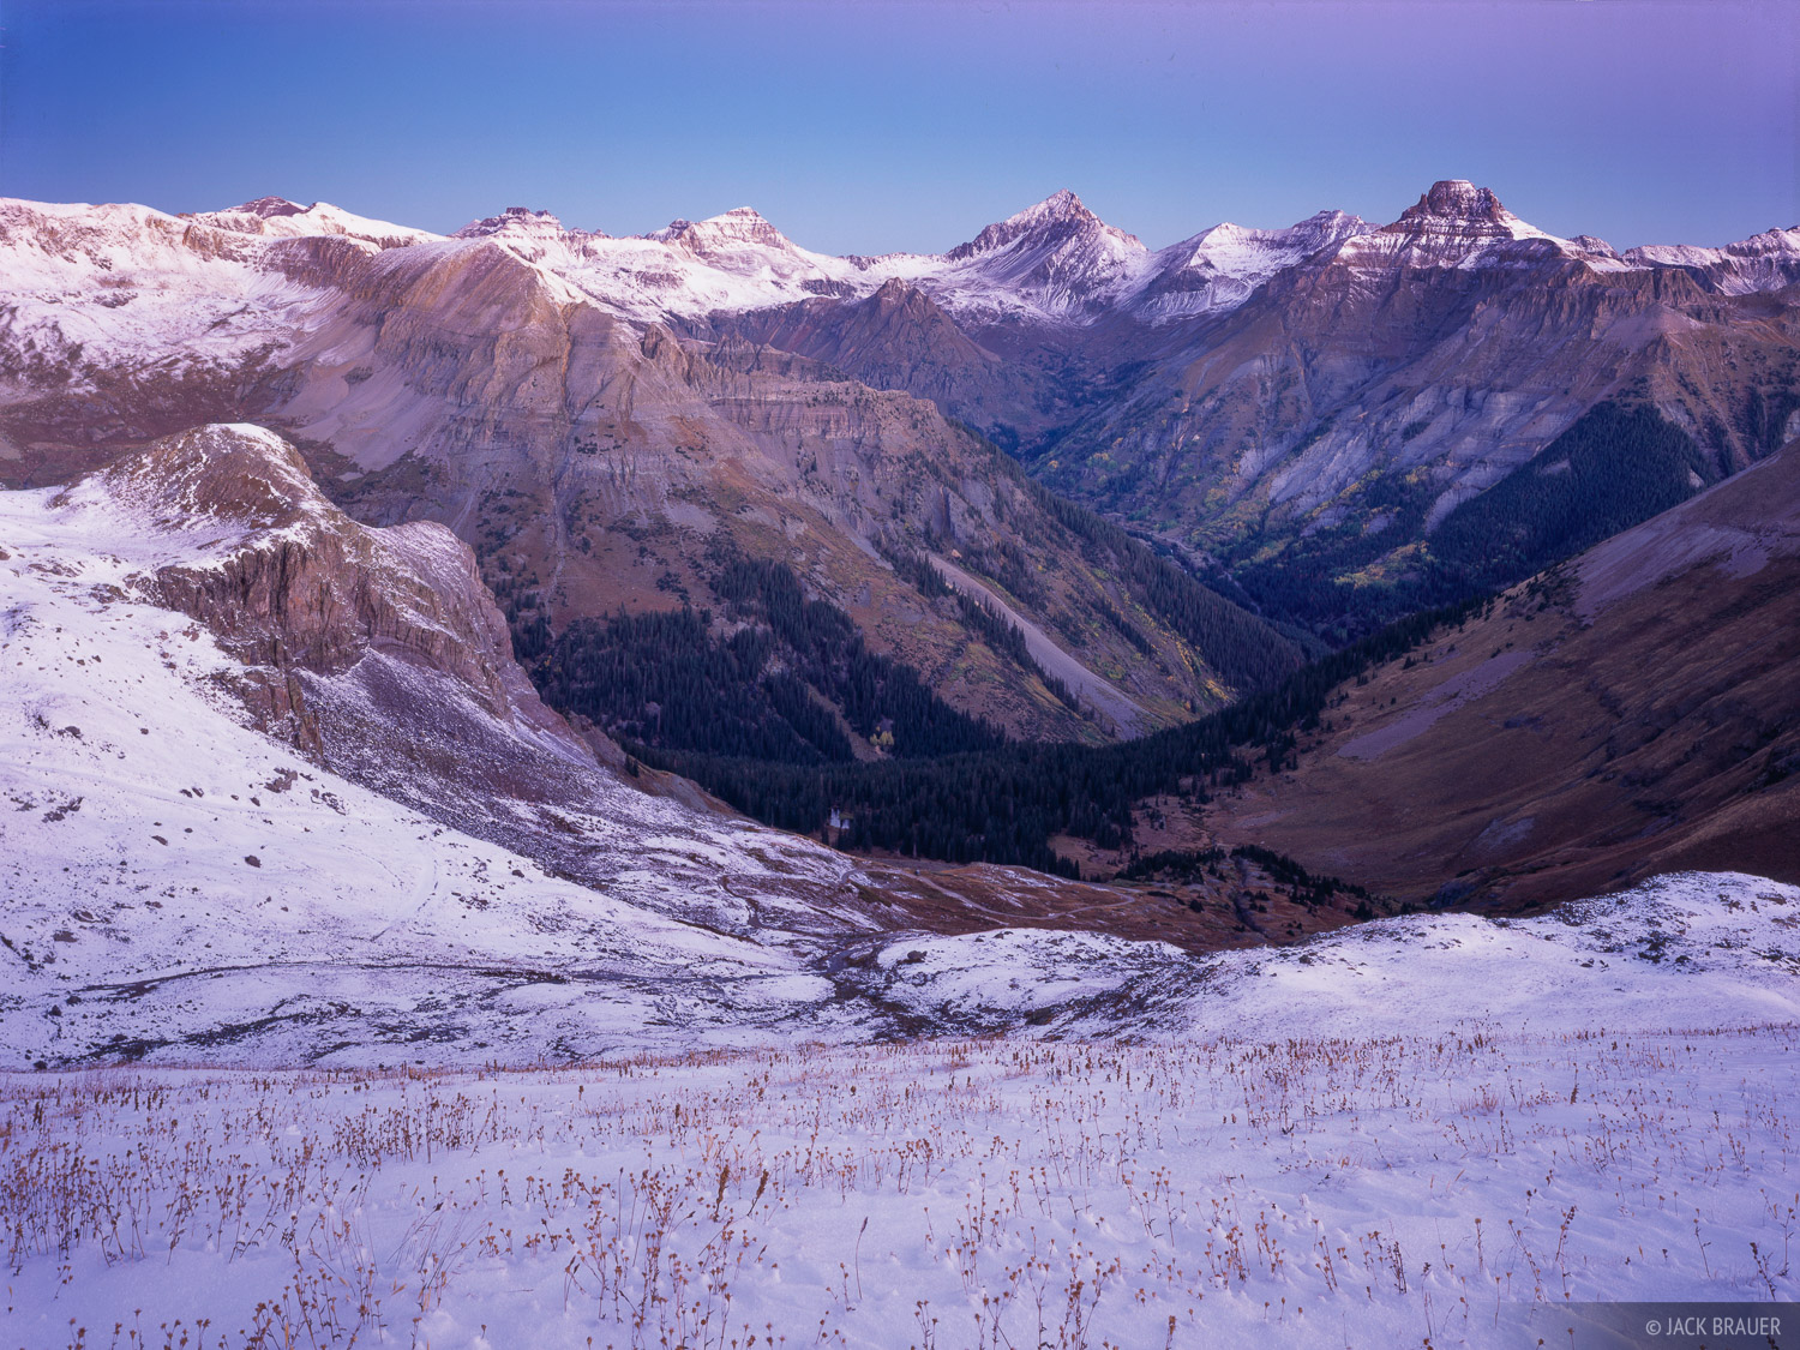 Dawn light illuminates Mt. Sneffles, Potosi Peak, and their lofty neighbors in the Sneffels Range, as seen from high on Richmond...